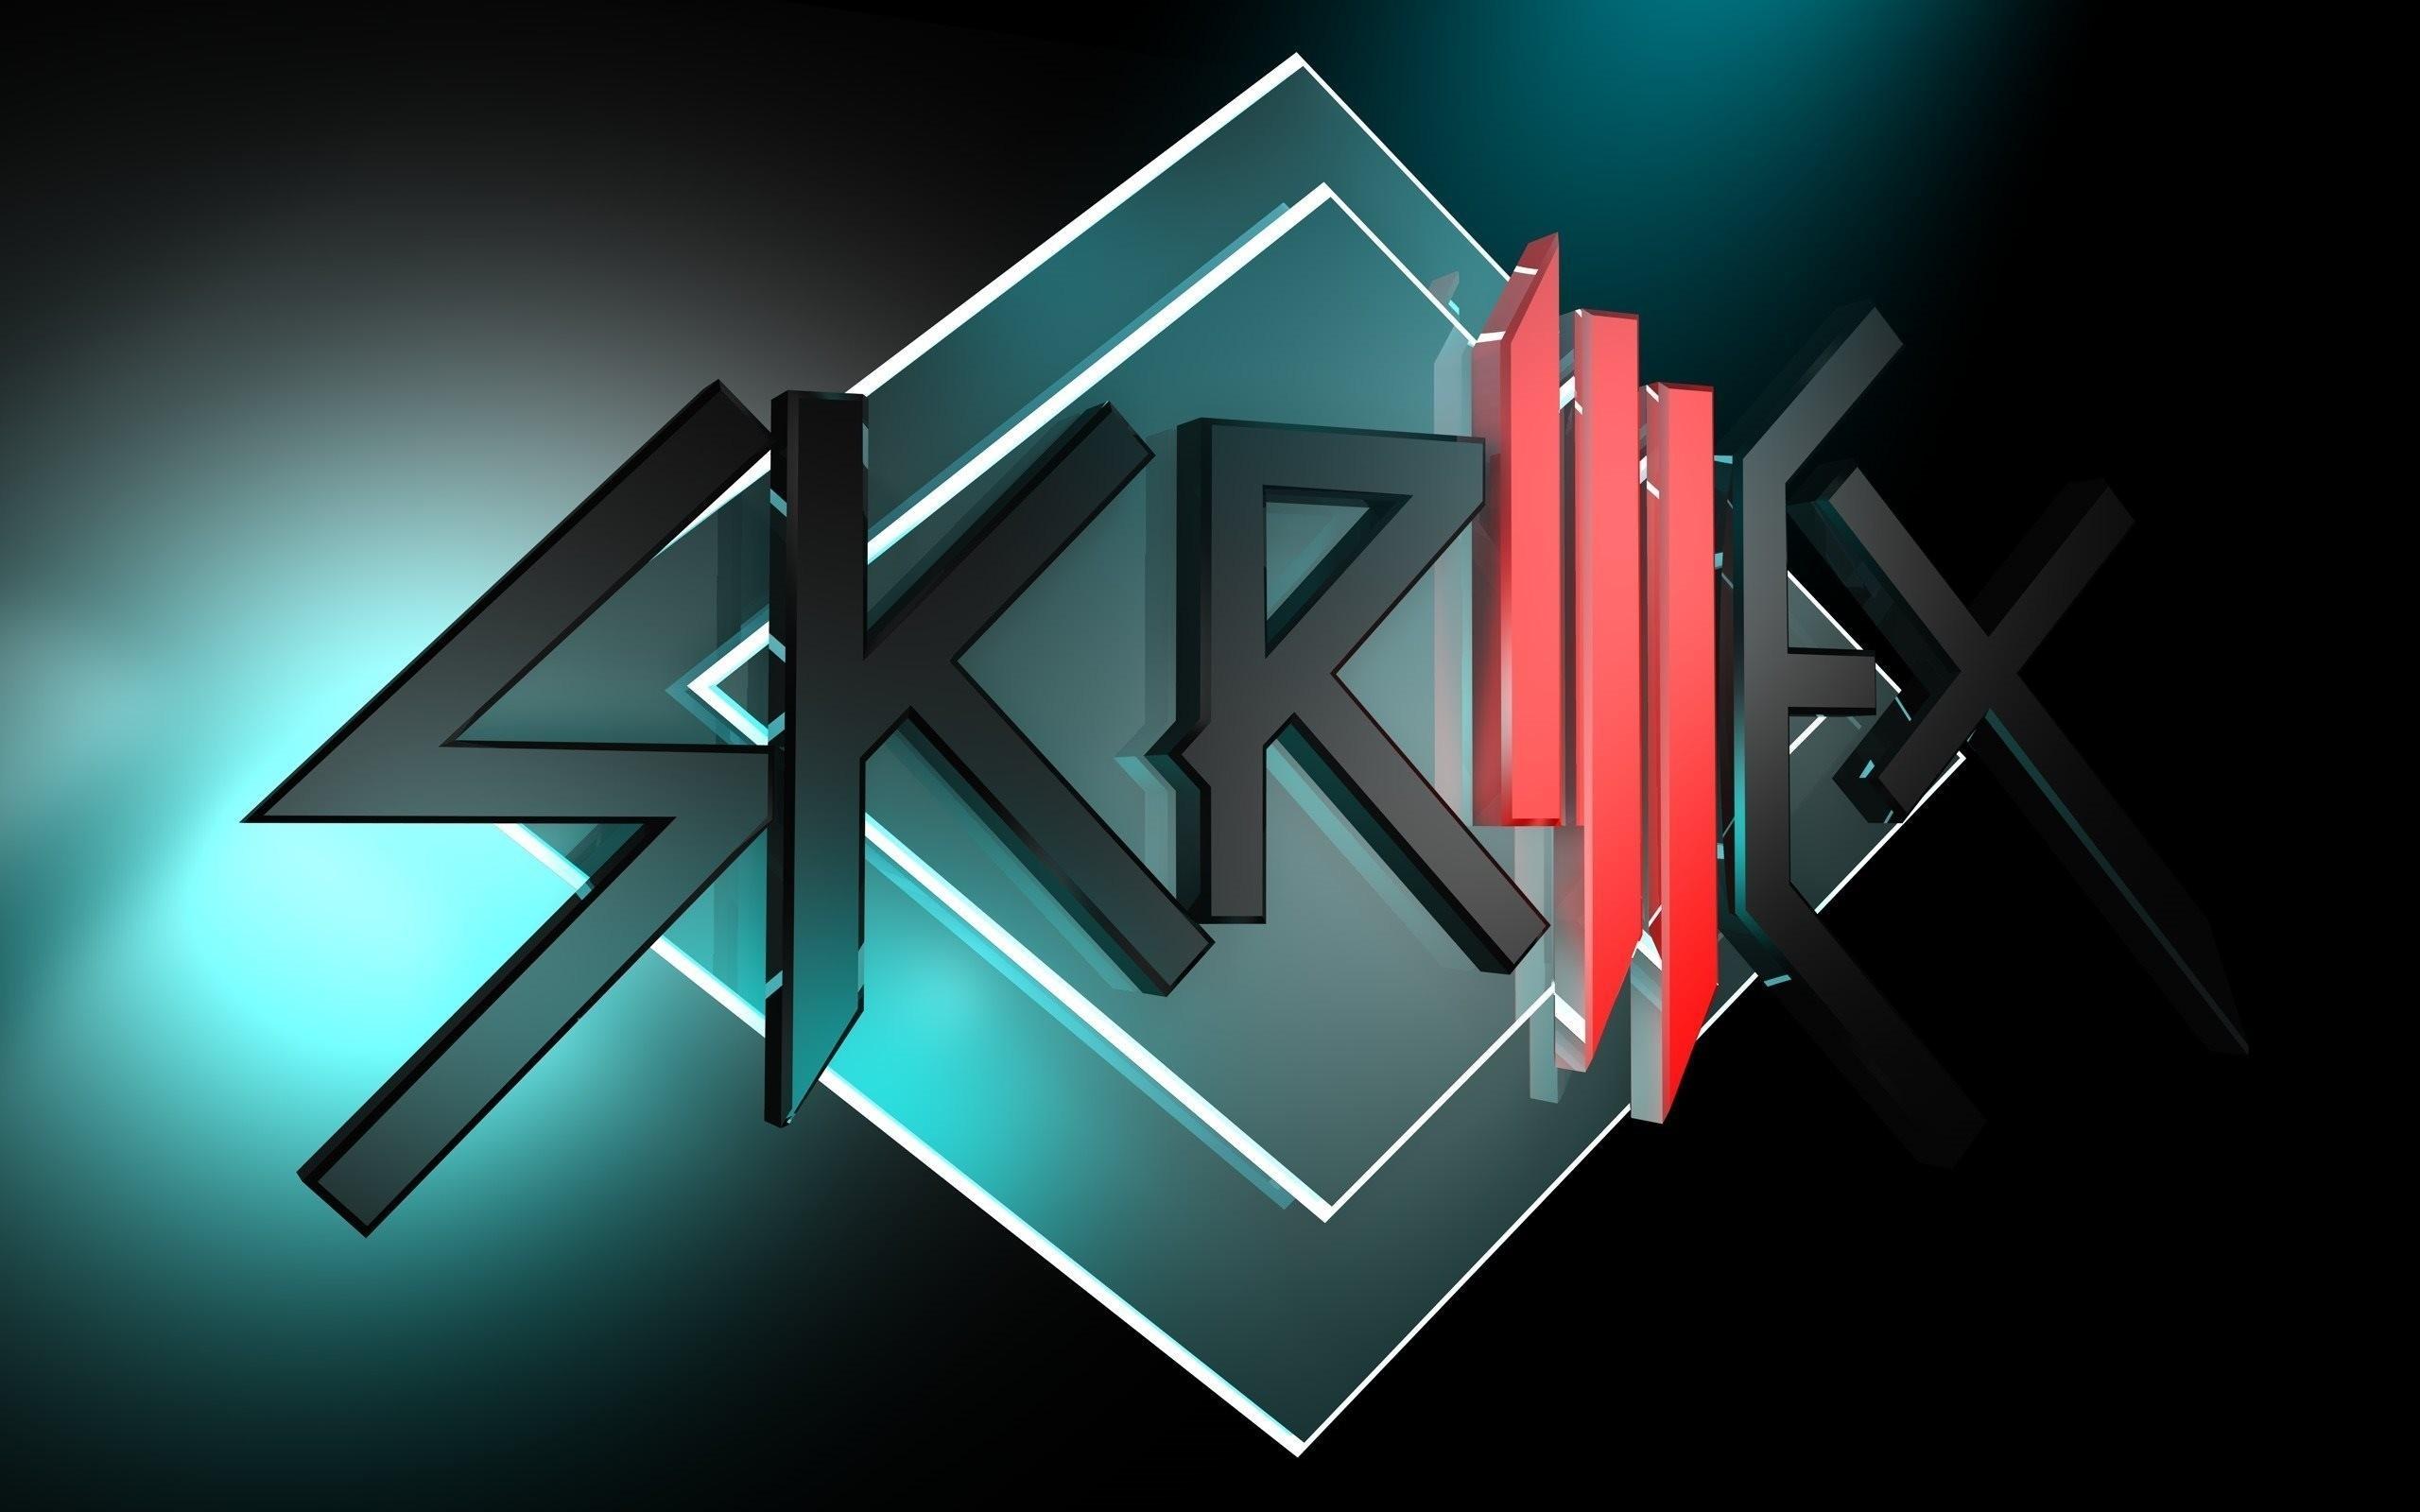 Download skrillex lettering music 240x320 resolution full hd 2k download original voltagebd Gallery